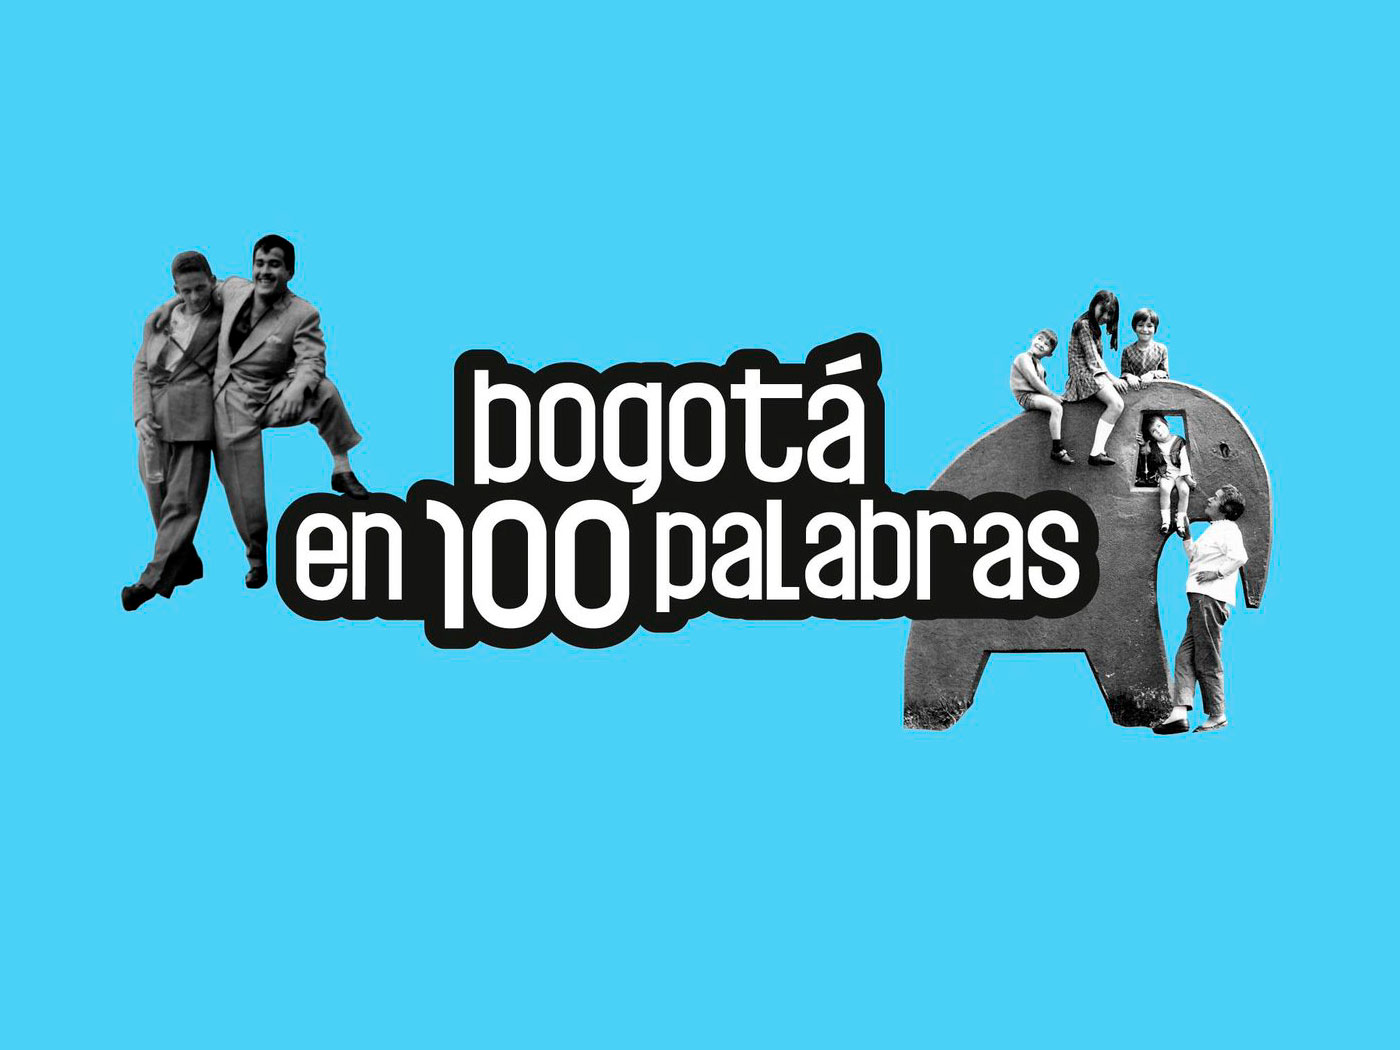 Se abre la convocatoria Bogotá a 100 palabras